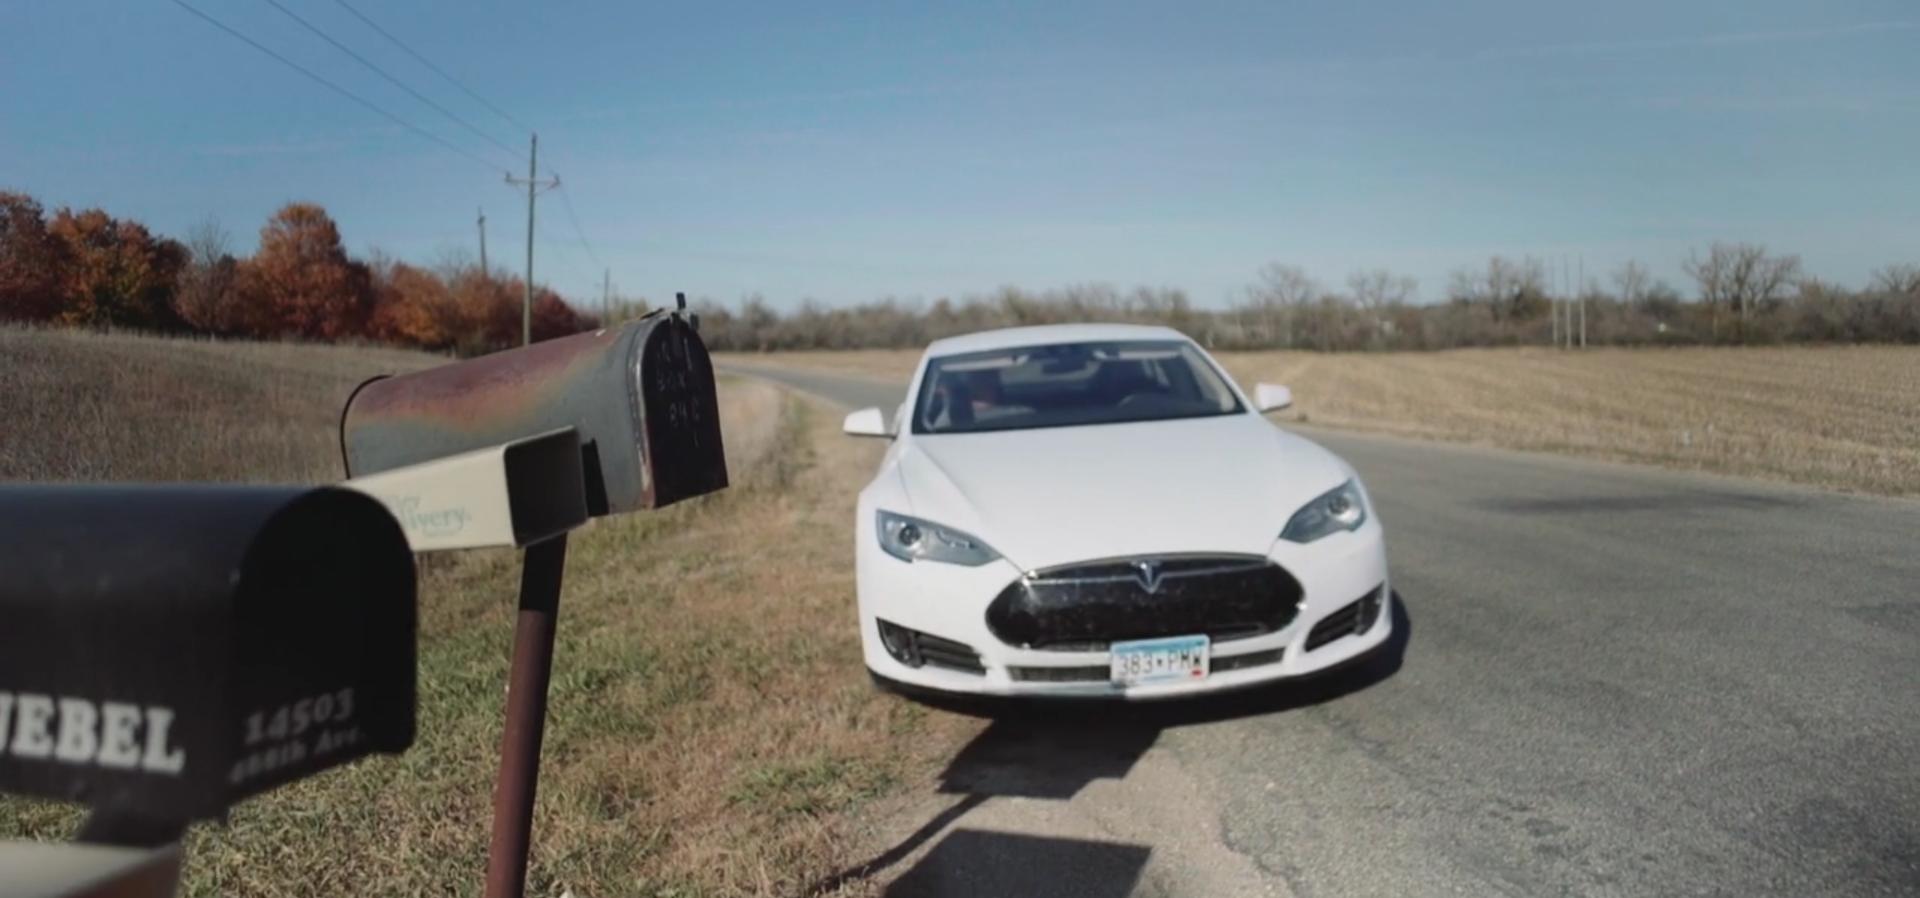 mail man Model S